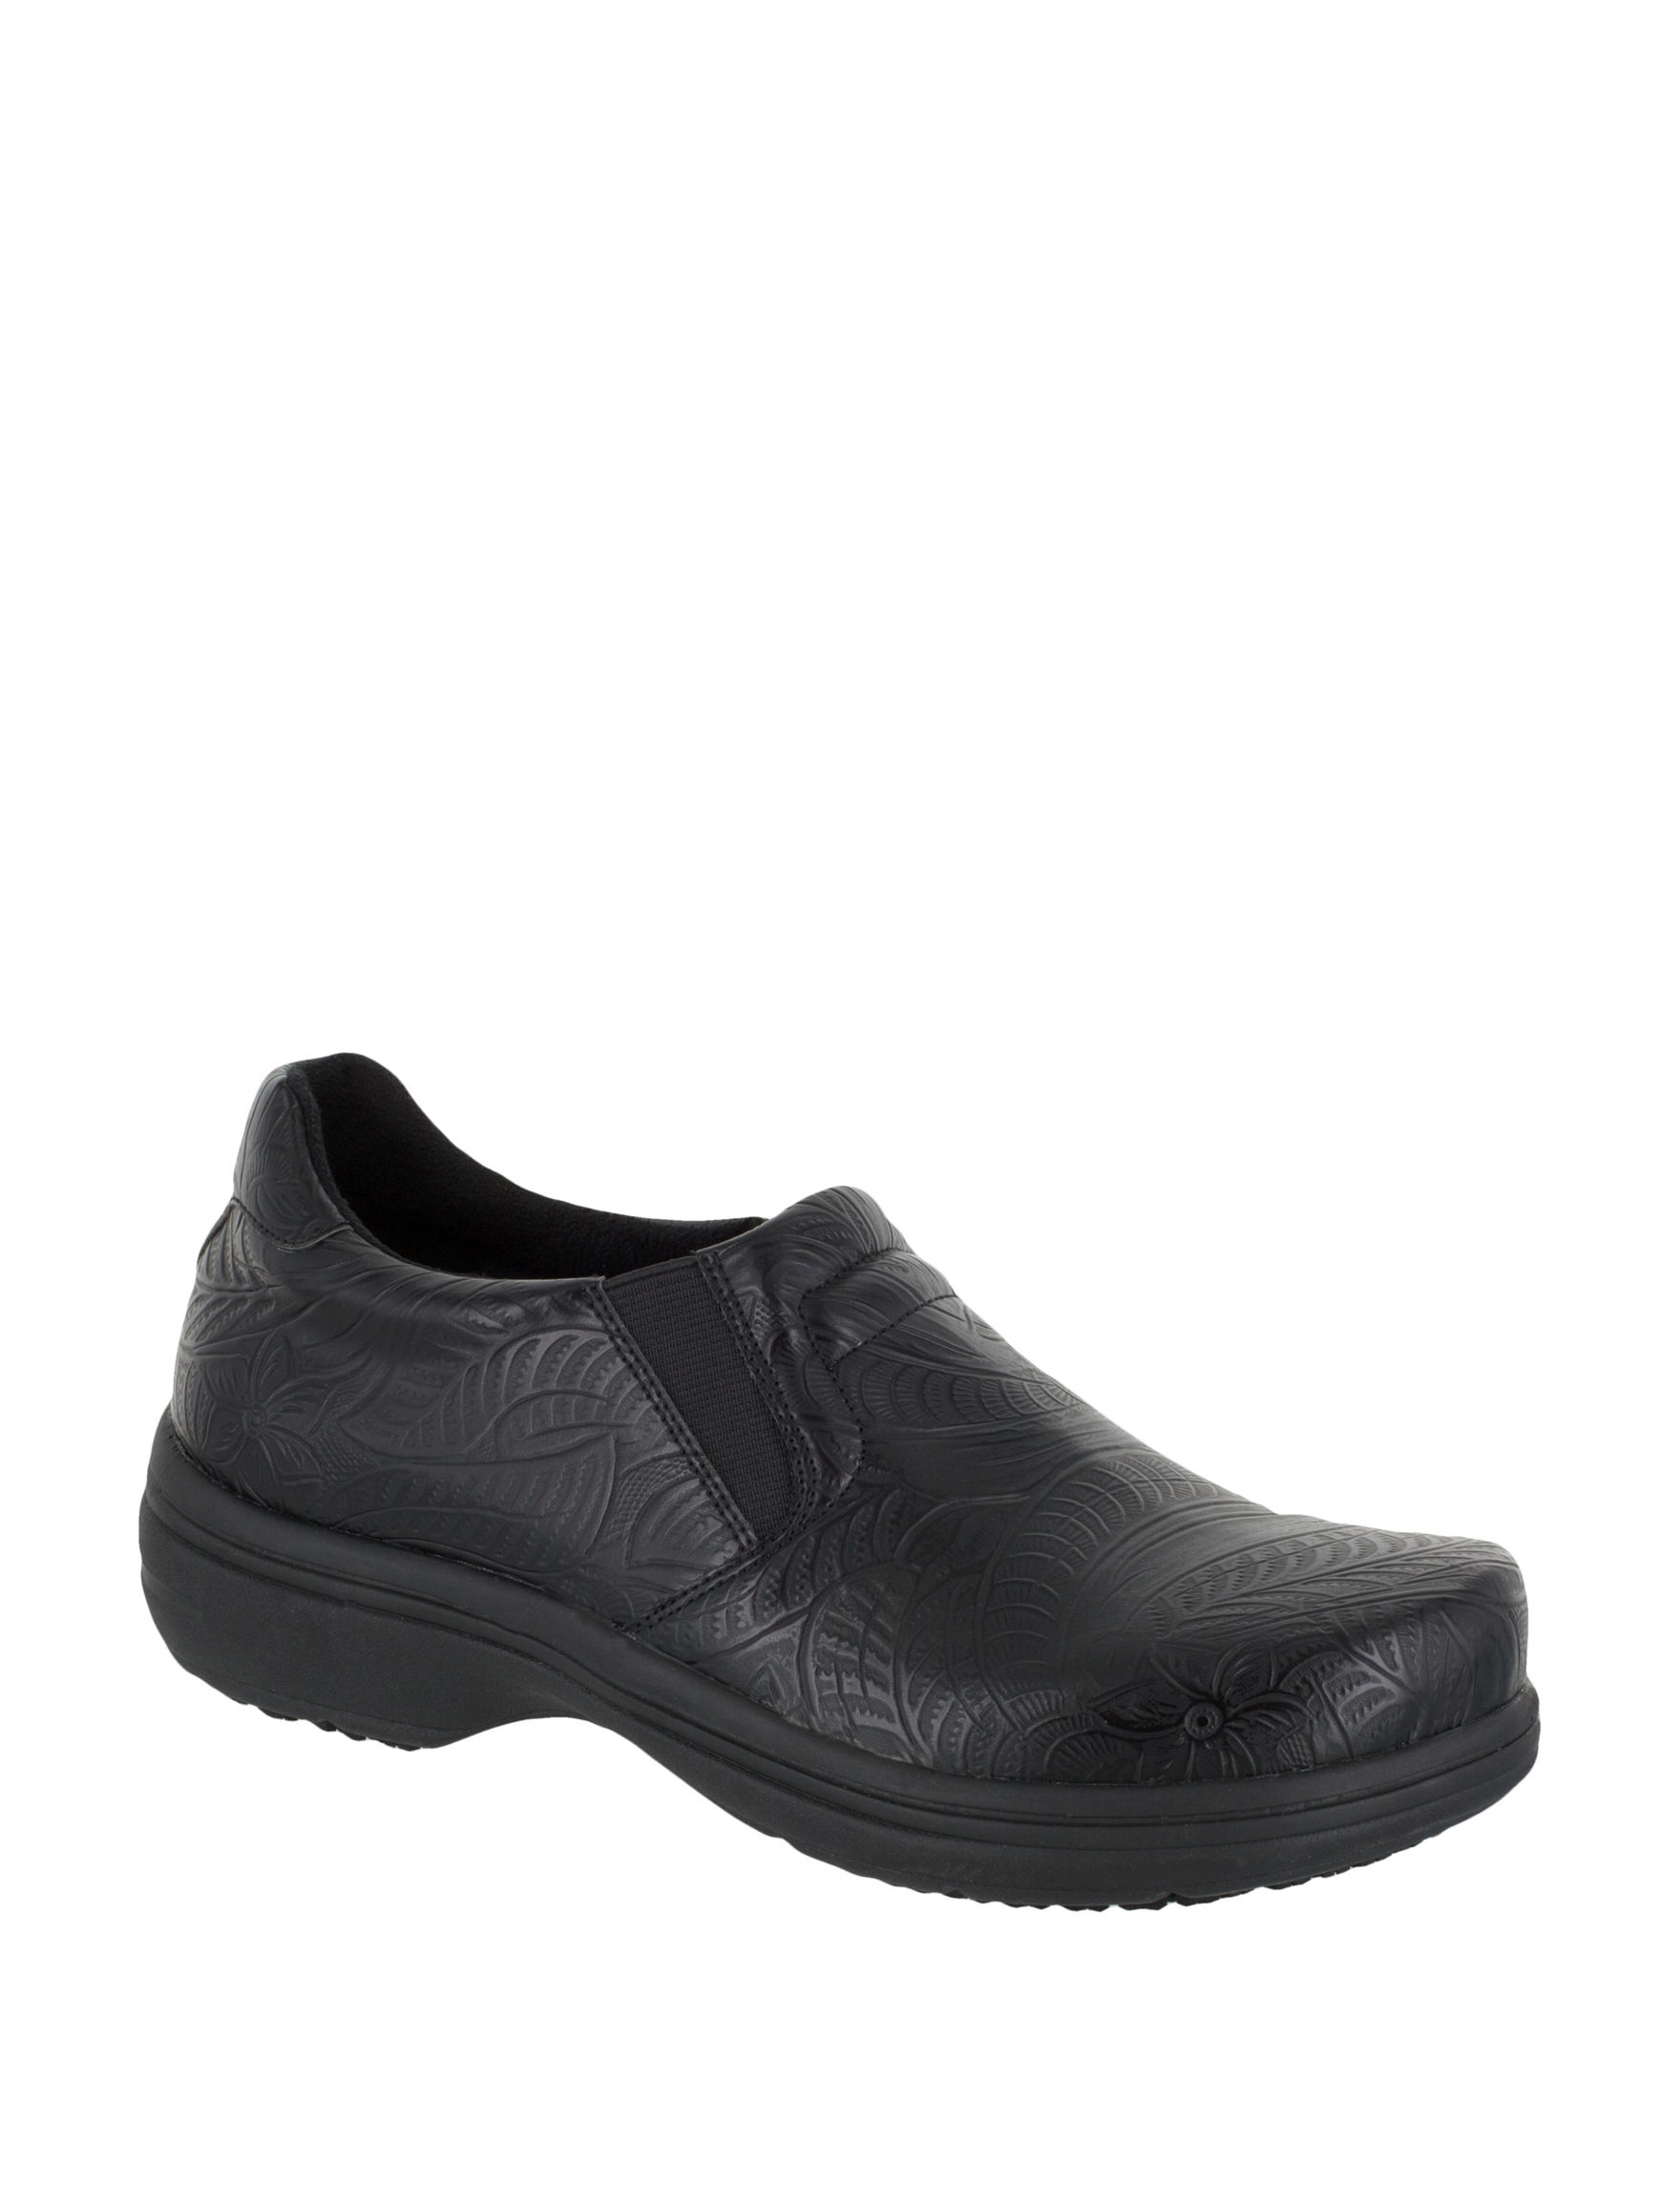 Easy Works by Easy Street Black Clogs Slip Resistant